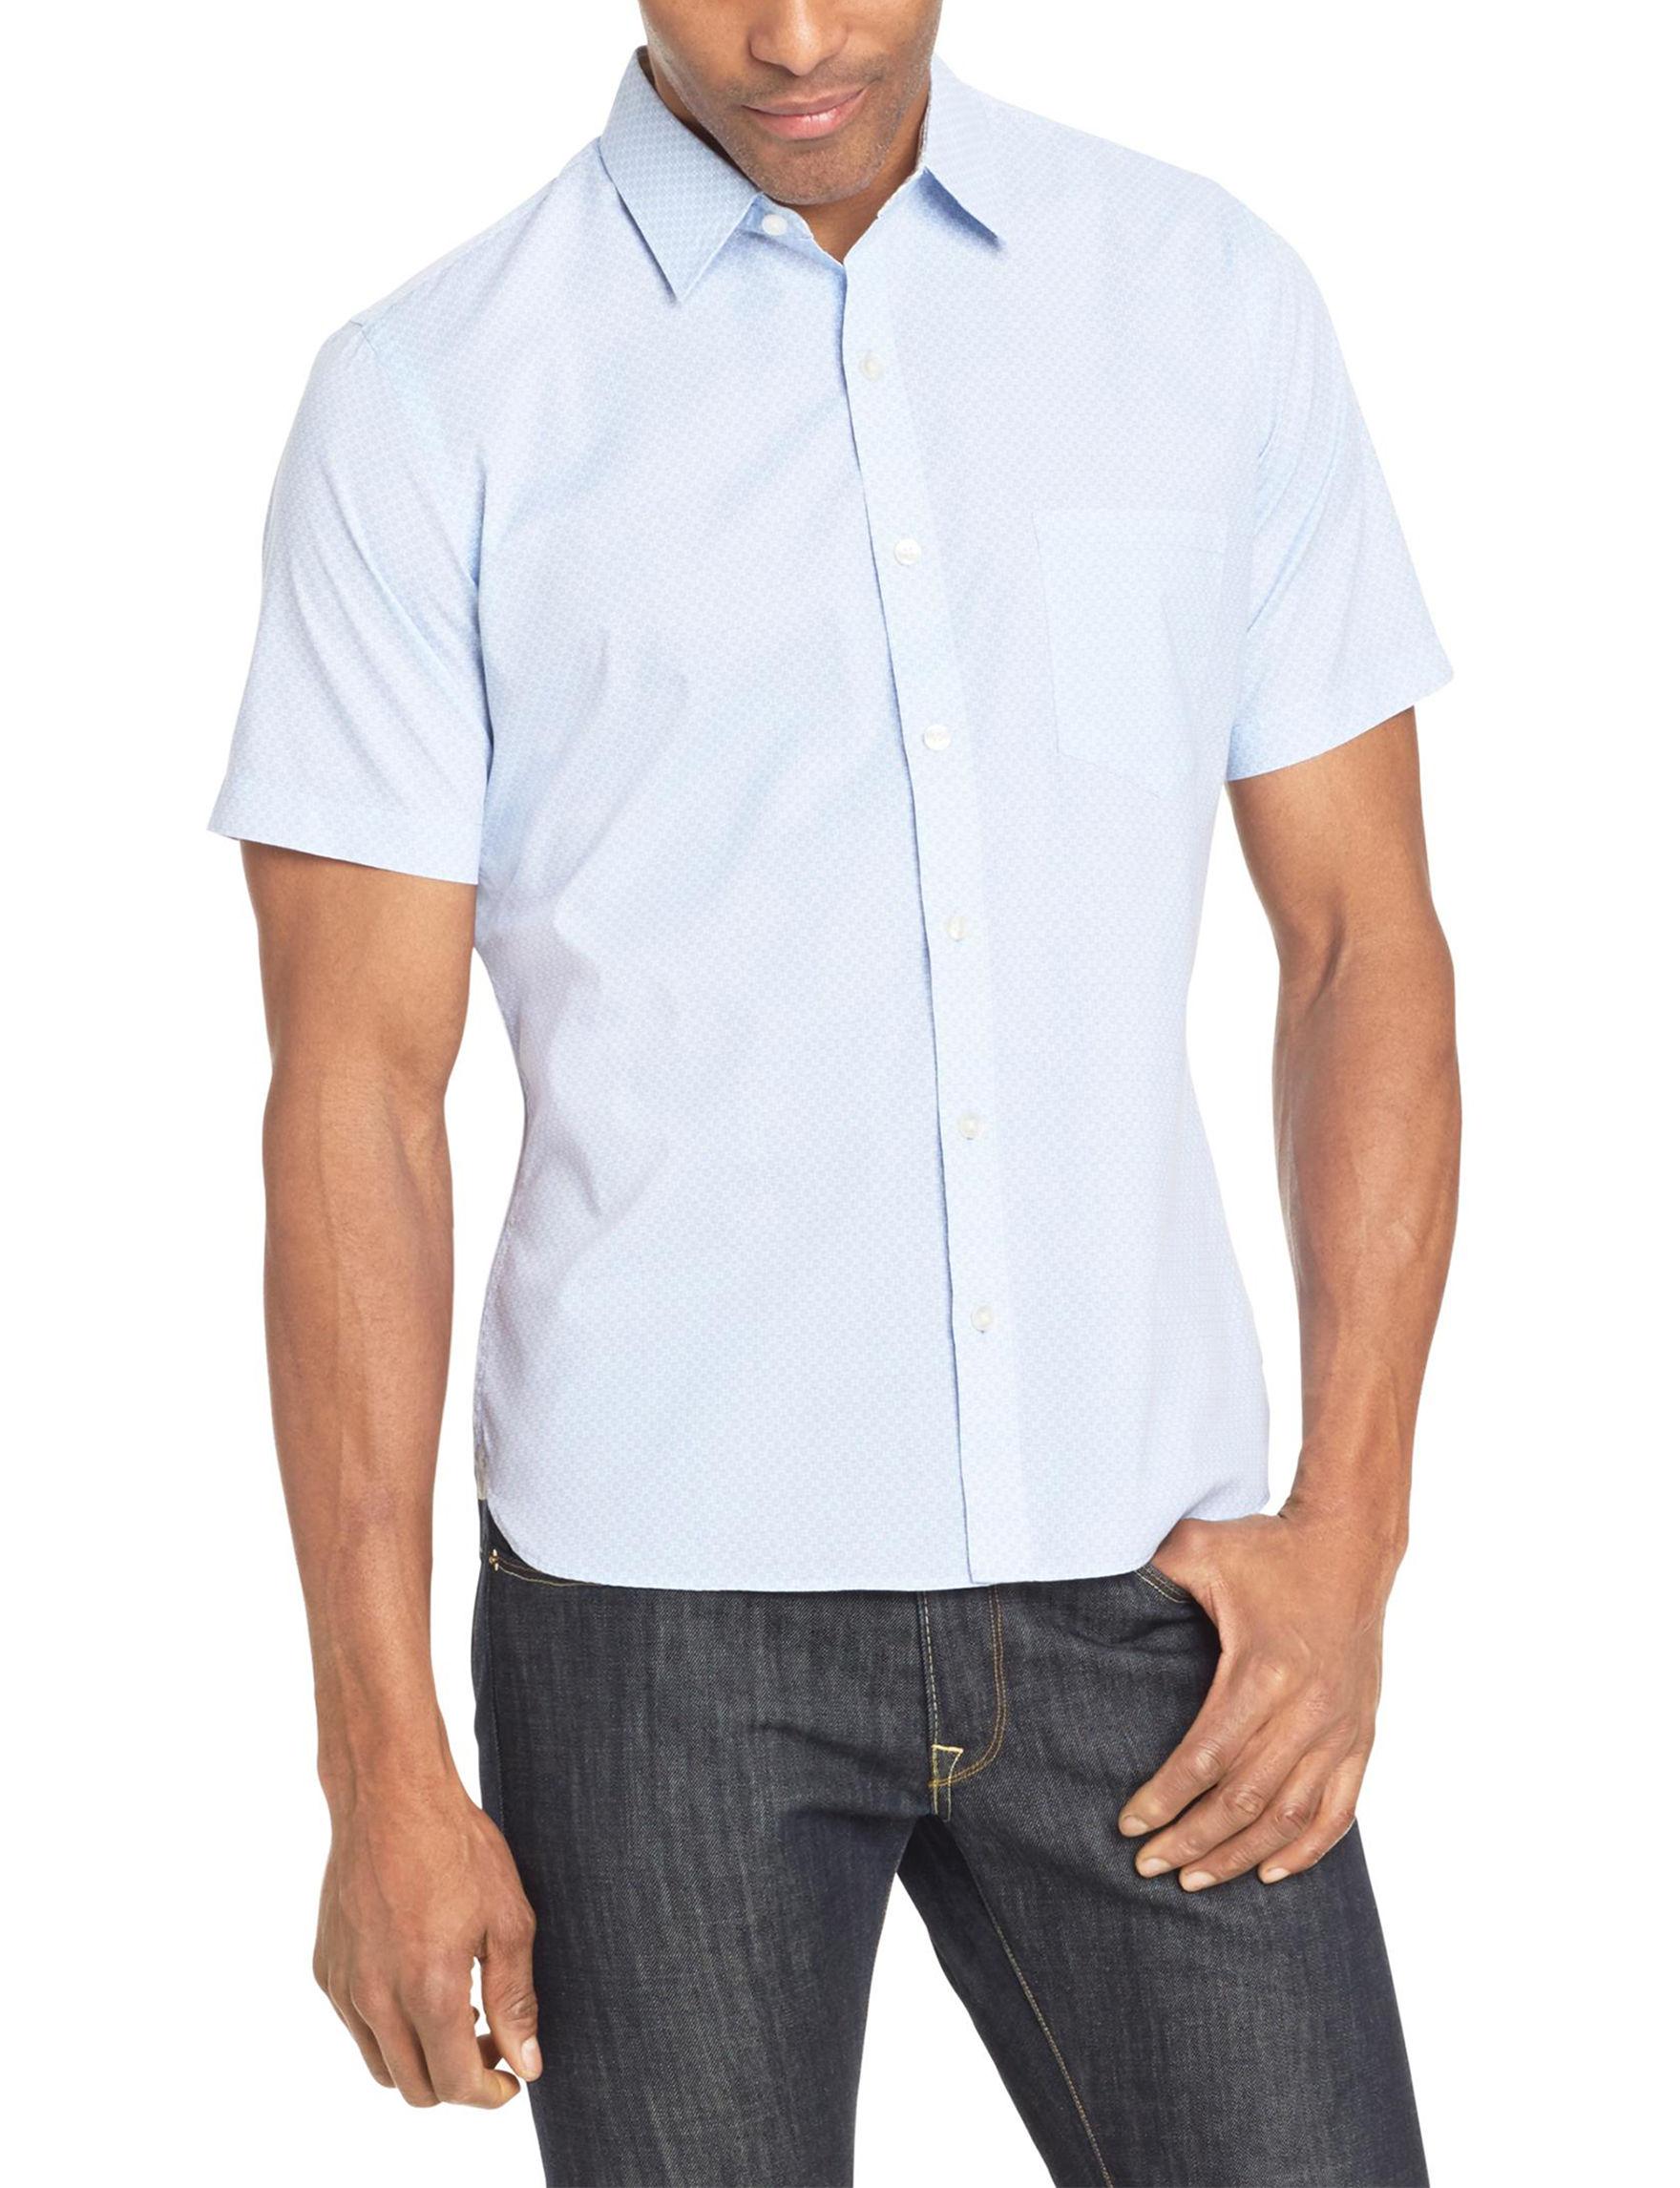 Van Heusen Blue Casual Button Down Shirts